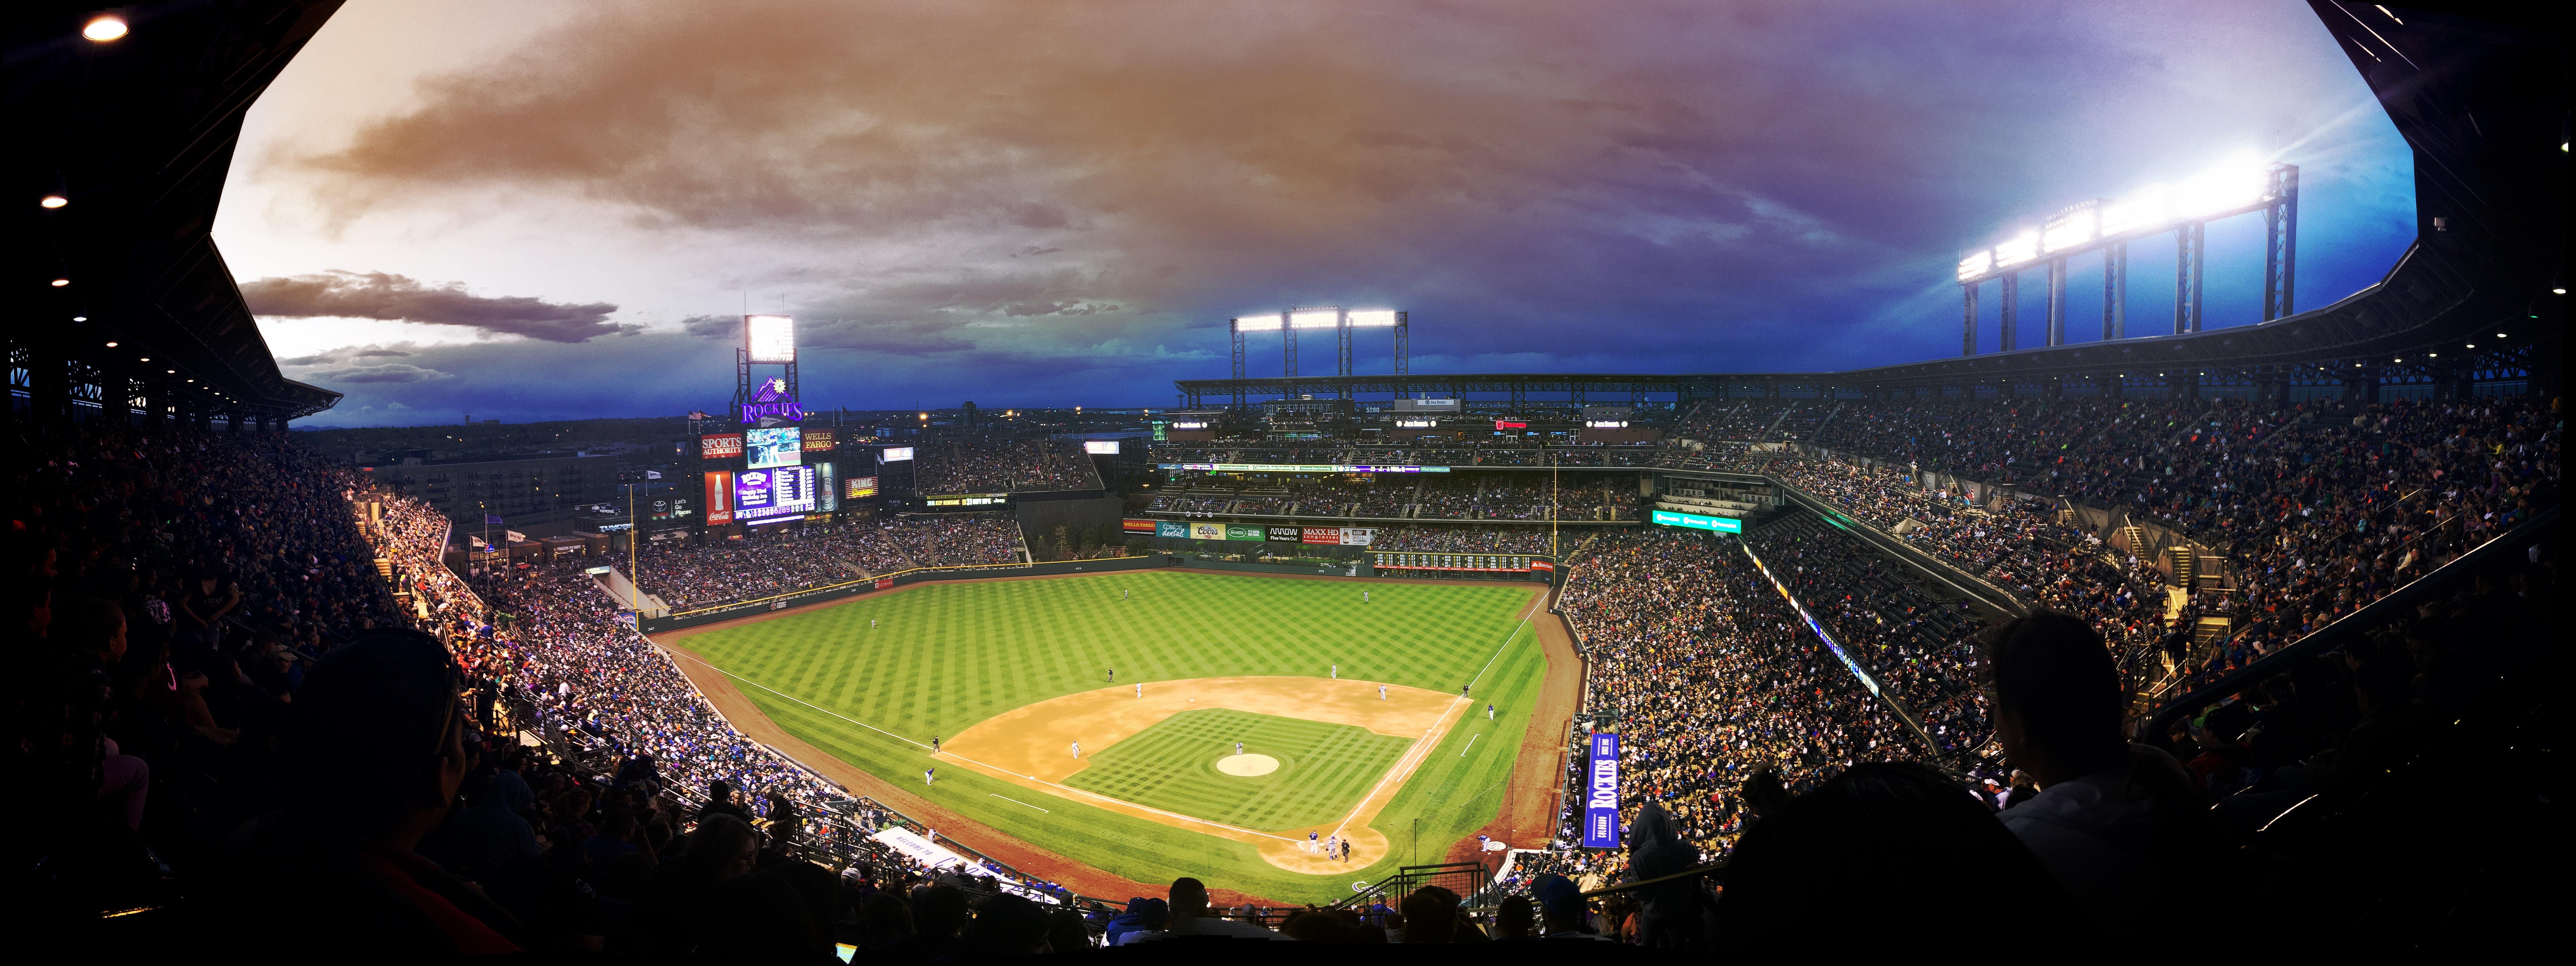 baseball-crowd-field-89699